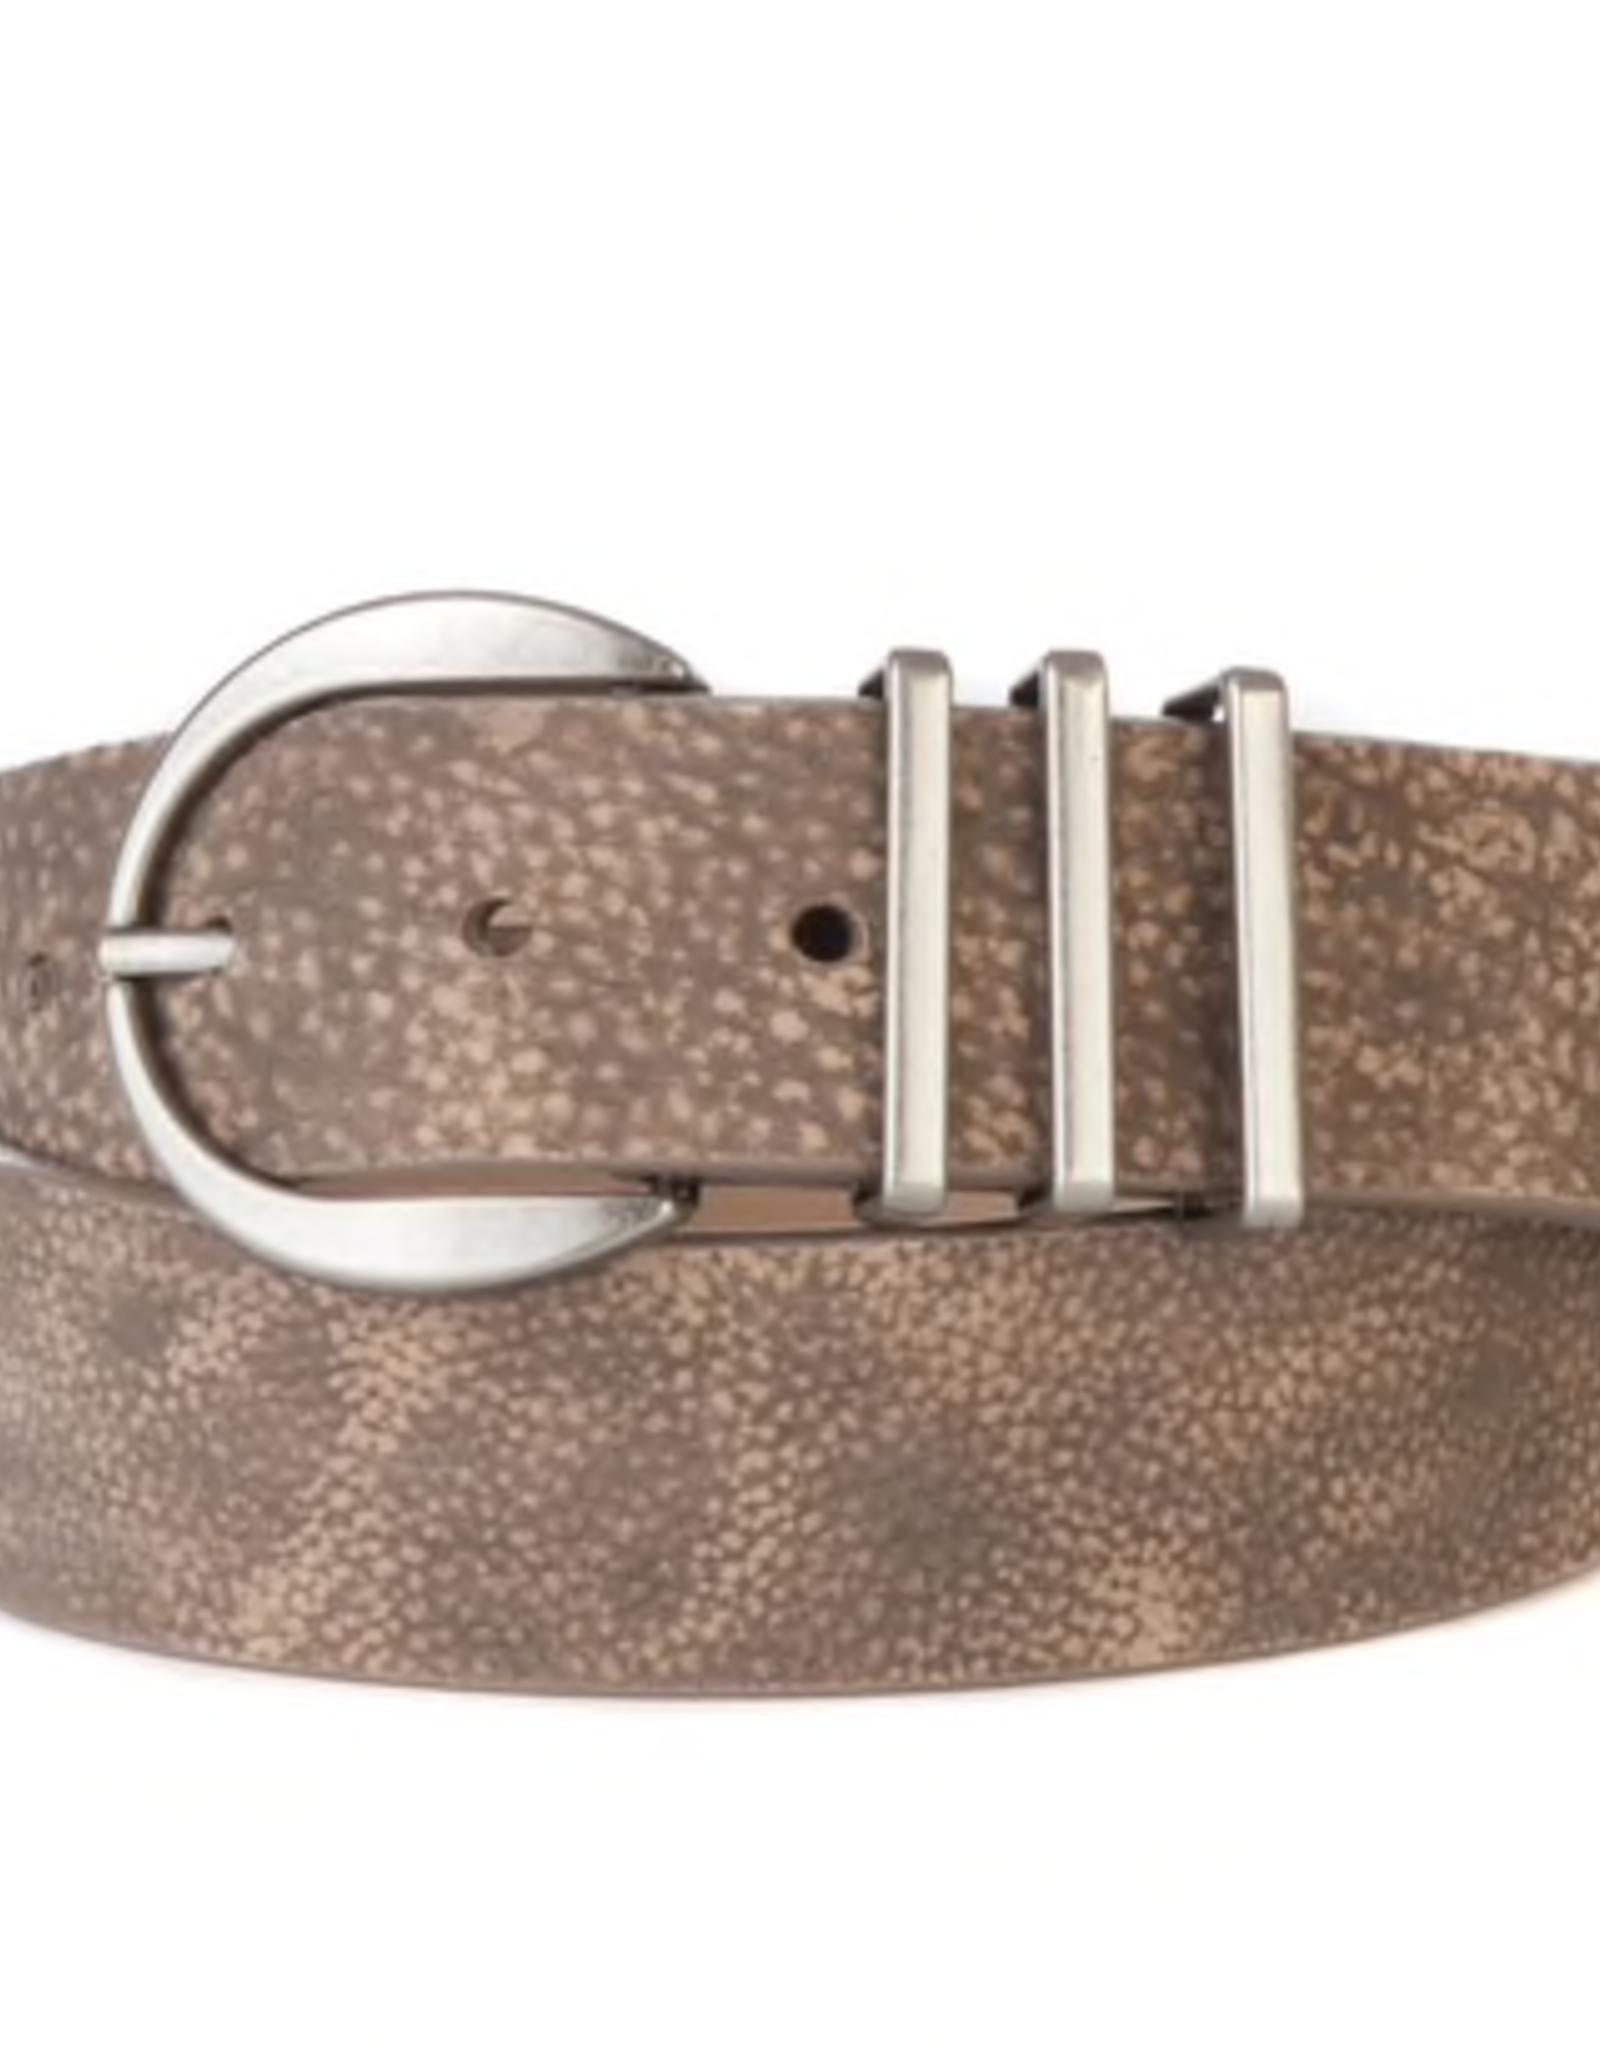 Brave 1992 Kiku Safari Brown Belt